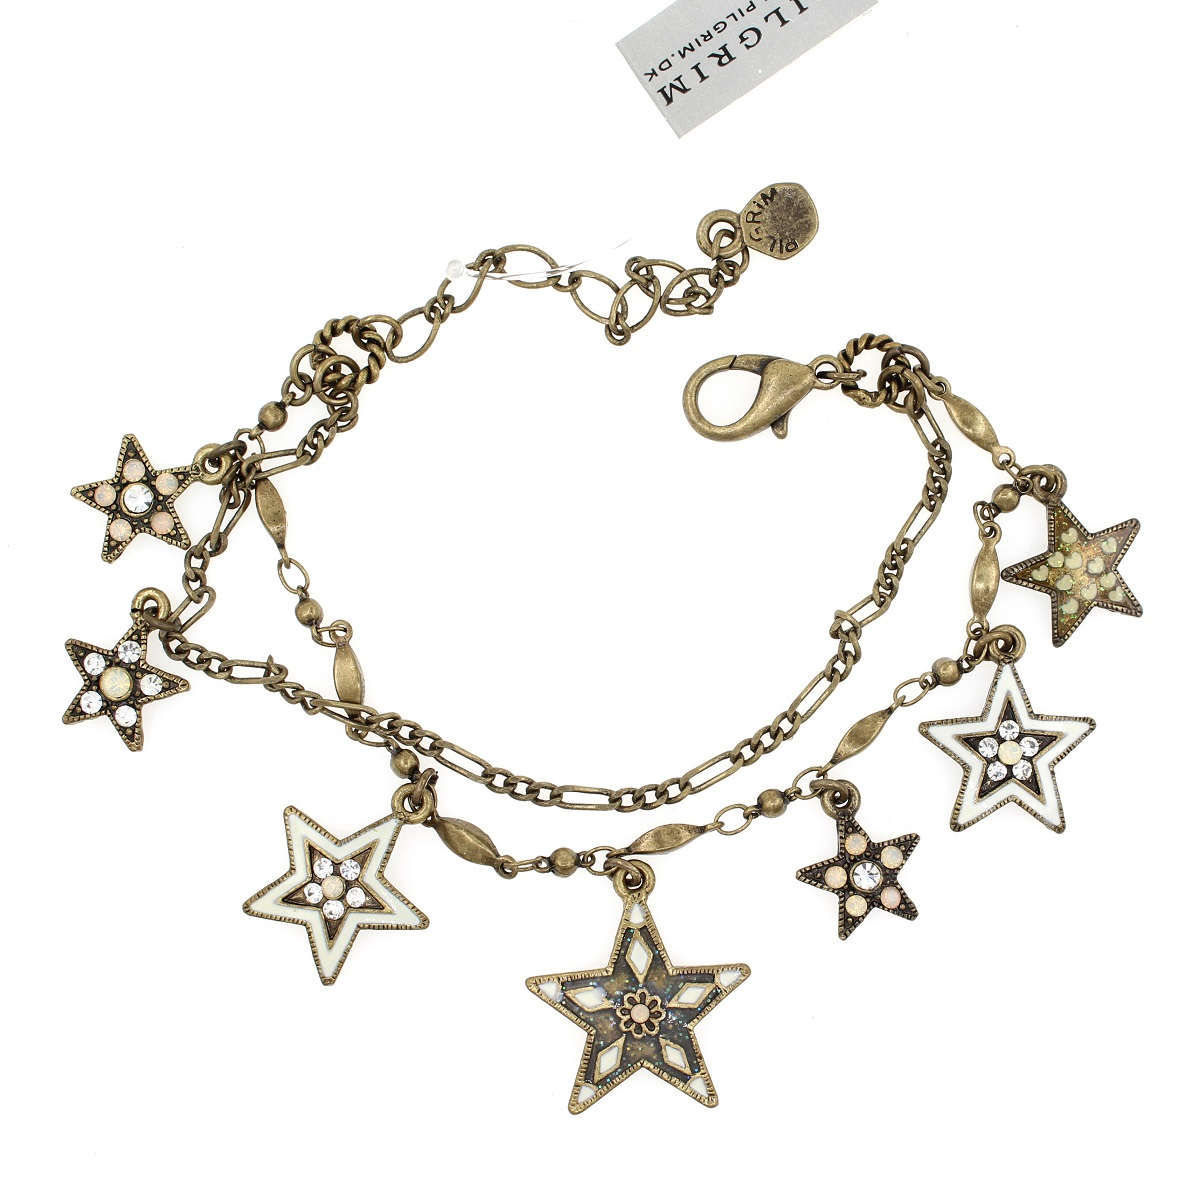 PILGRIM - STARS - Double Strand Charm Bracelet - Gold Plate/White Swarovski BNWT